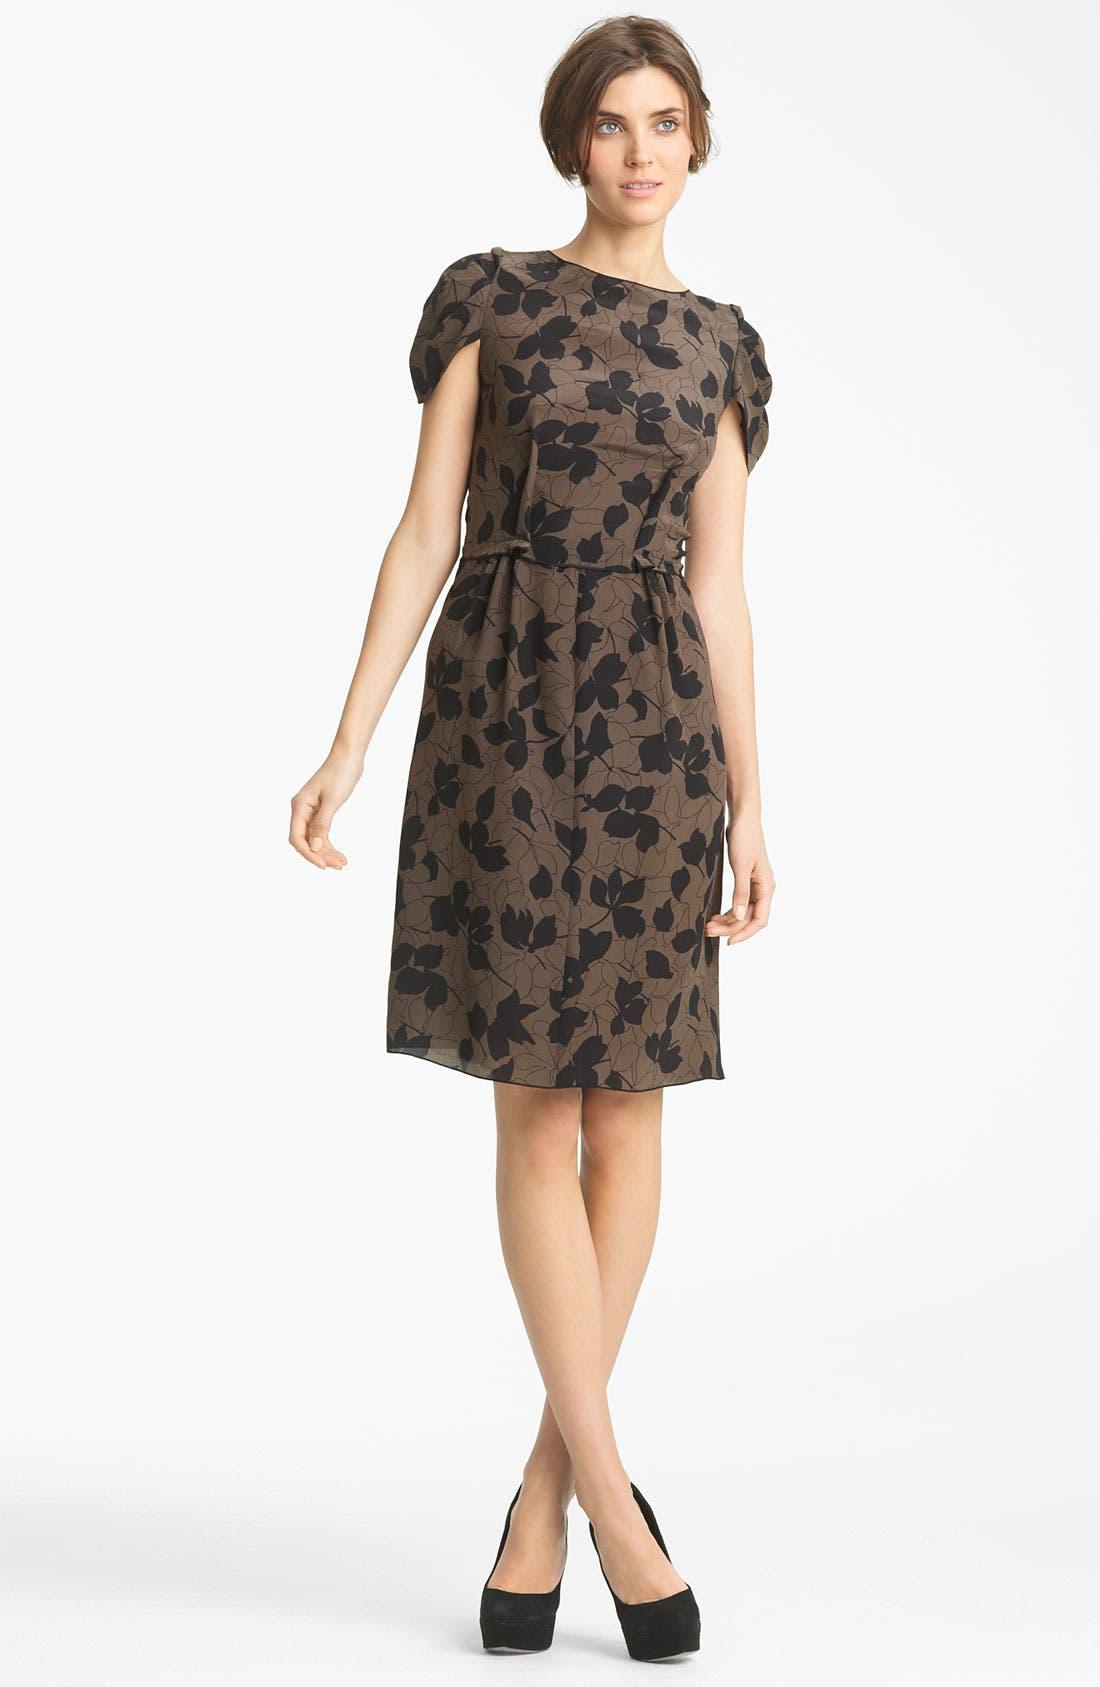 Alternate Image 1 Selected - Nina Ricci 'Camo Fleur' Print Silk Crepe Dress